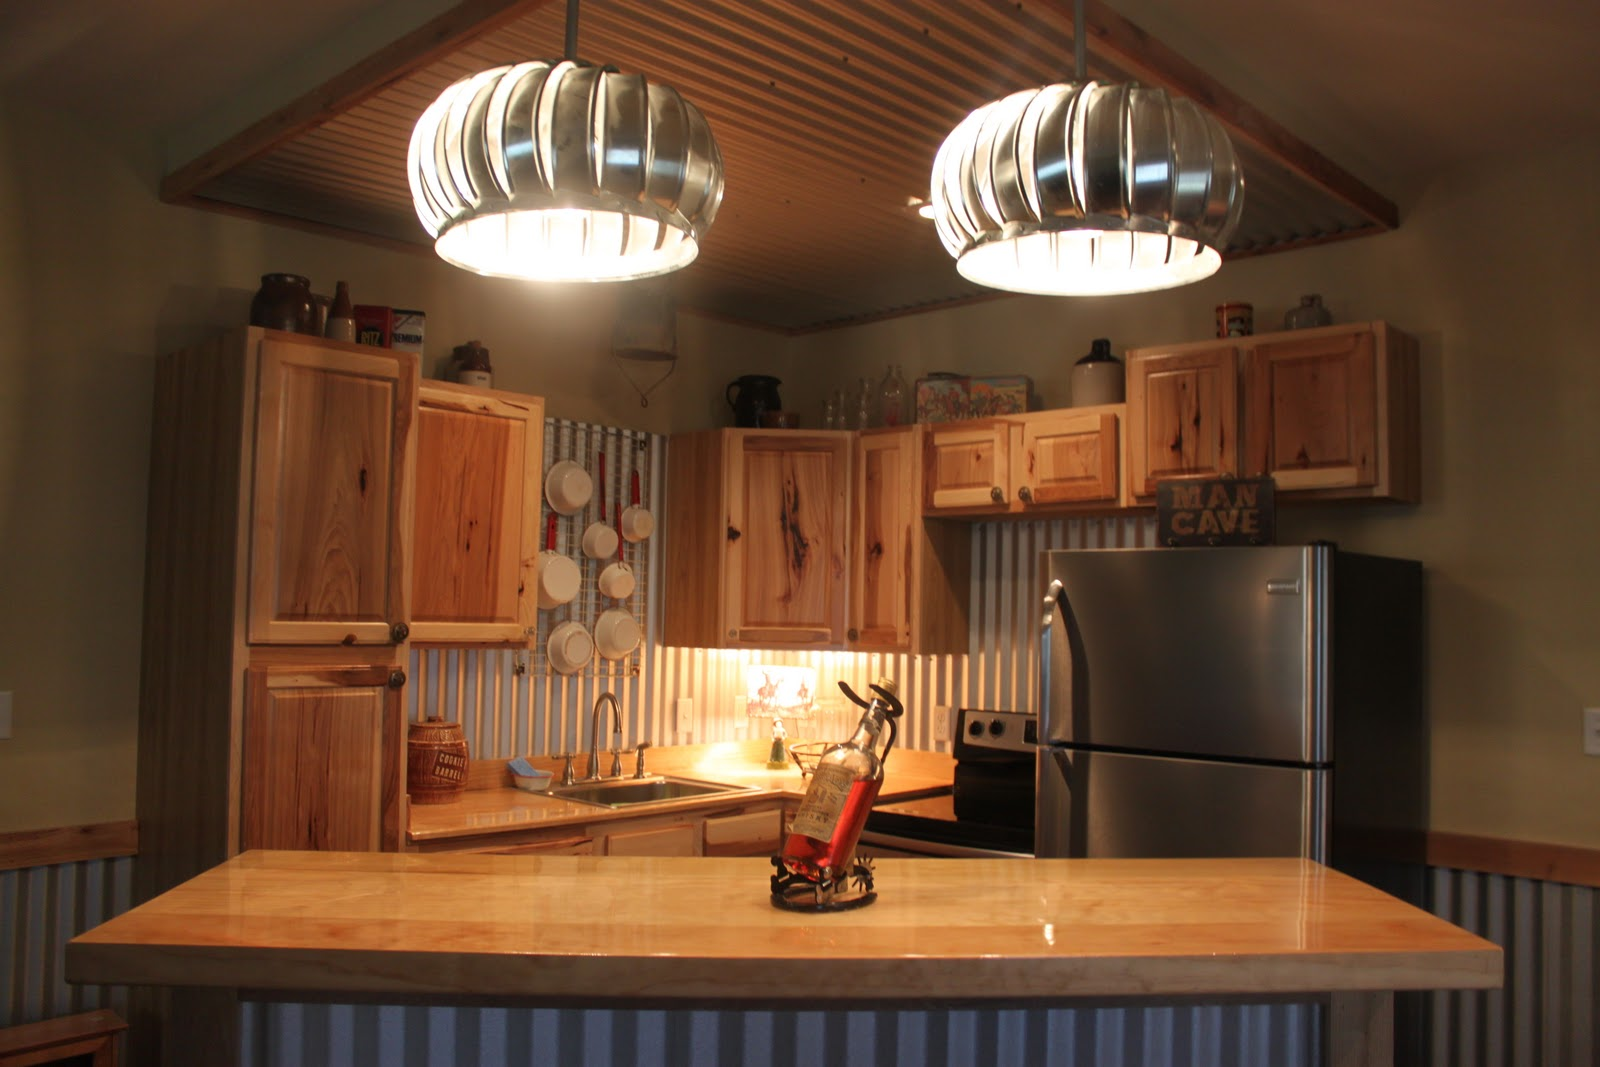 IMG_0714 Pallet Ideas For Kitchen Backsplash on kitchen pallet table, kitchen pallet floor, kitchen pallet art, kitchen pallet shelves, kitchen pallet shelf, kitchen pallet wall,